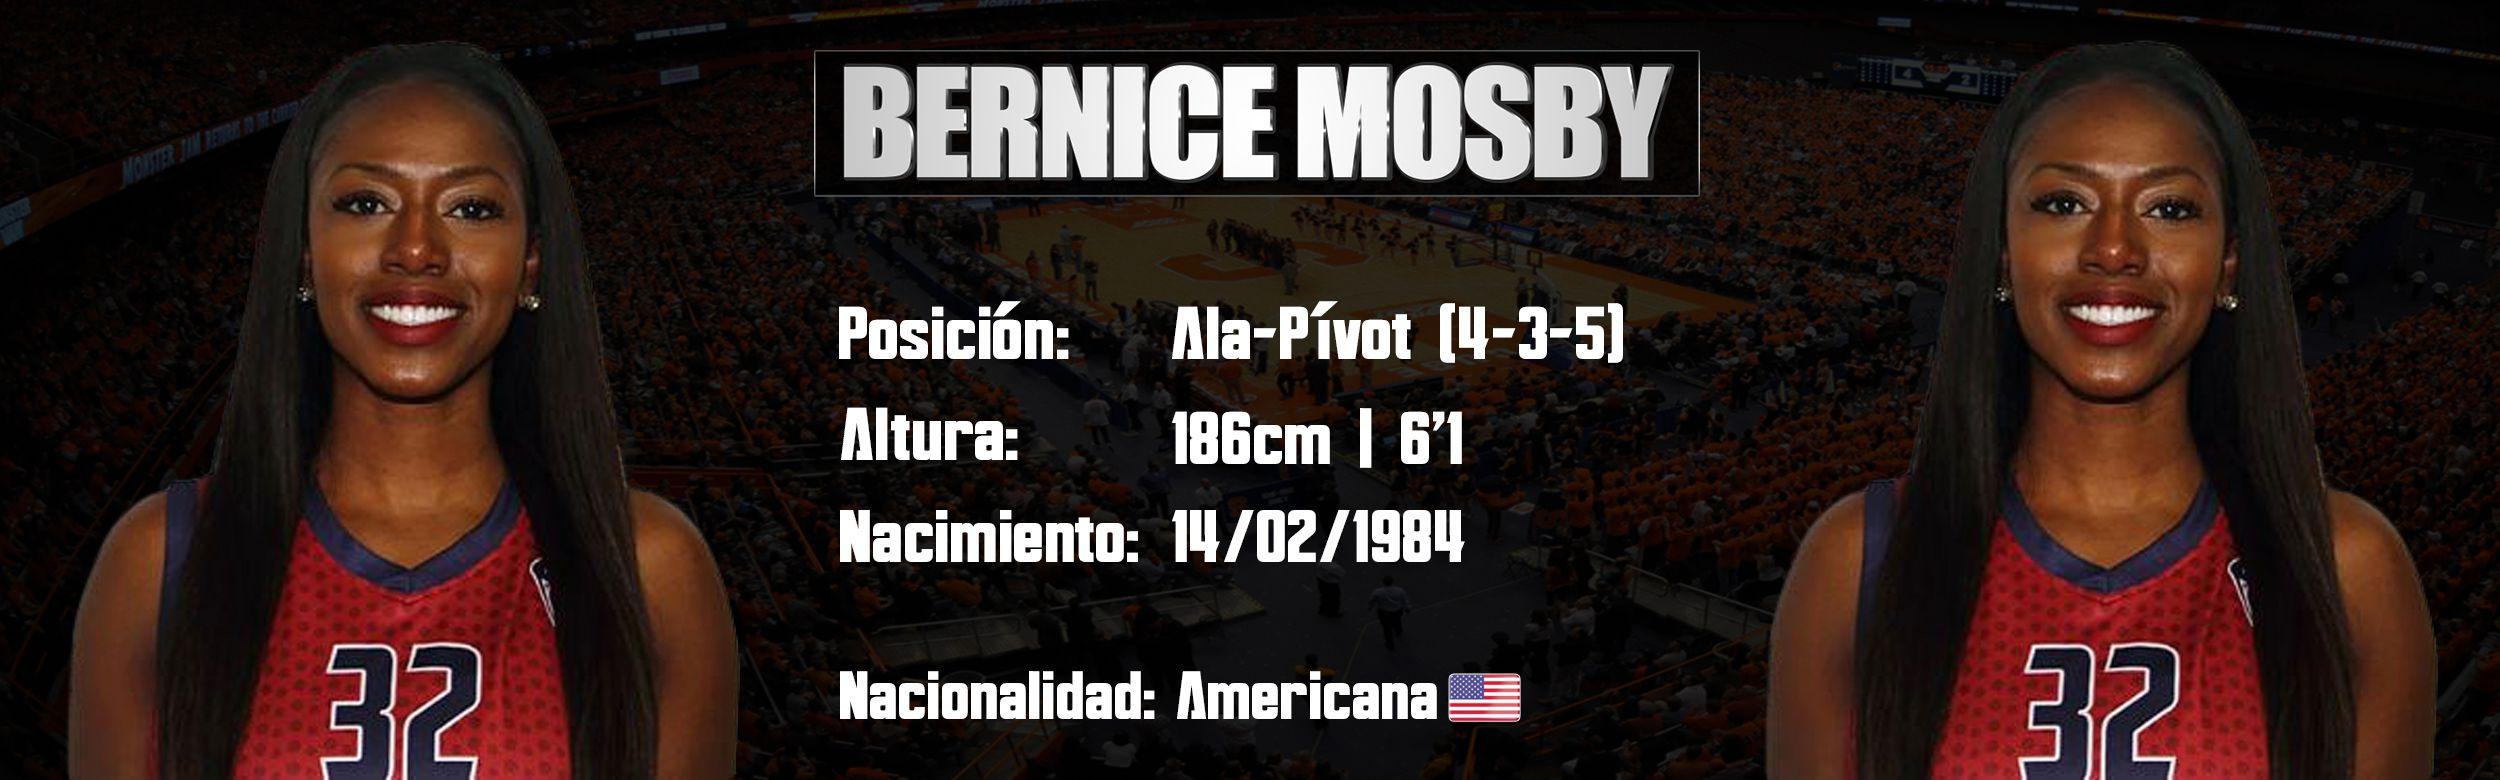 Bernice Mosby